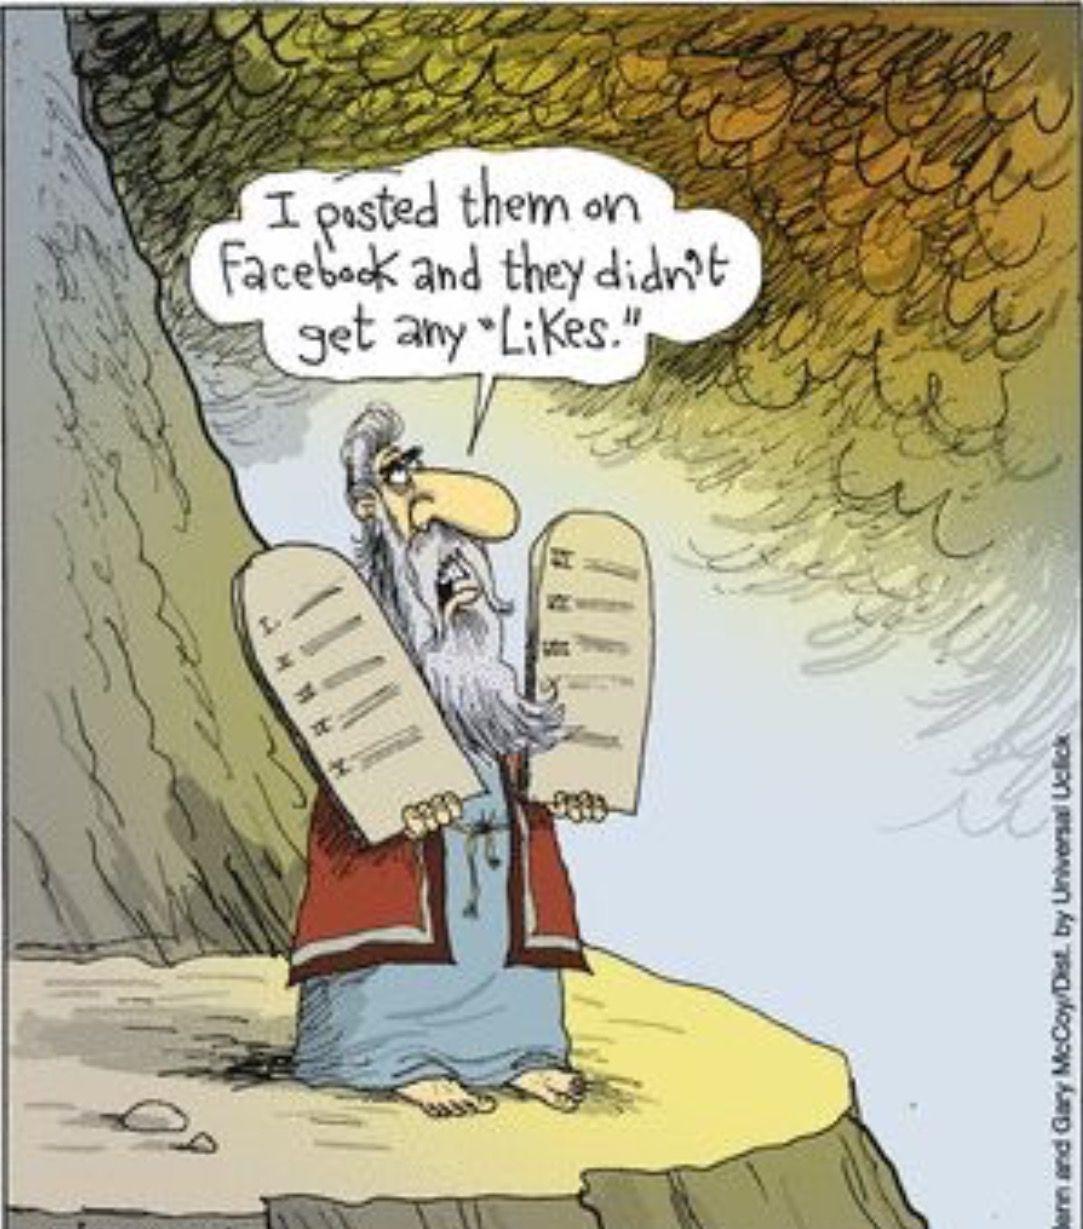 Pin on Christian Comics, Illustrations & Funnies